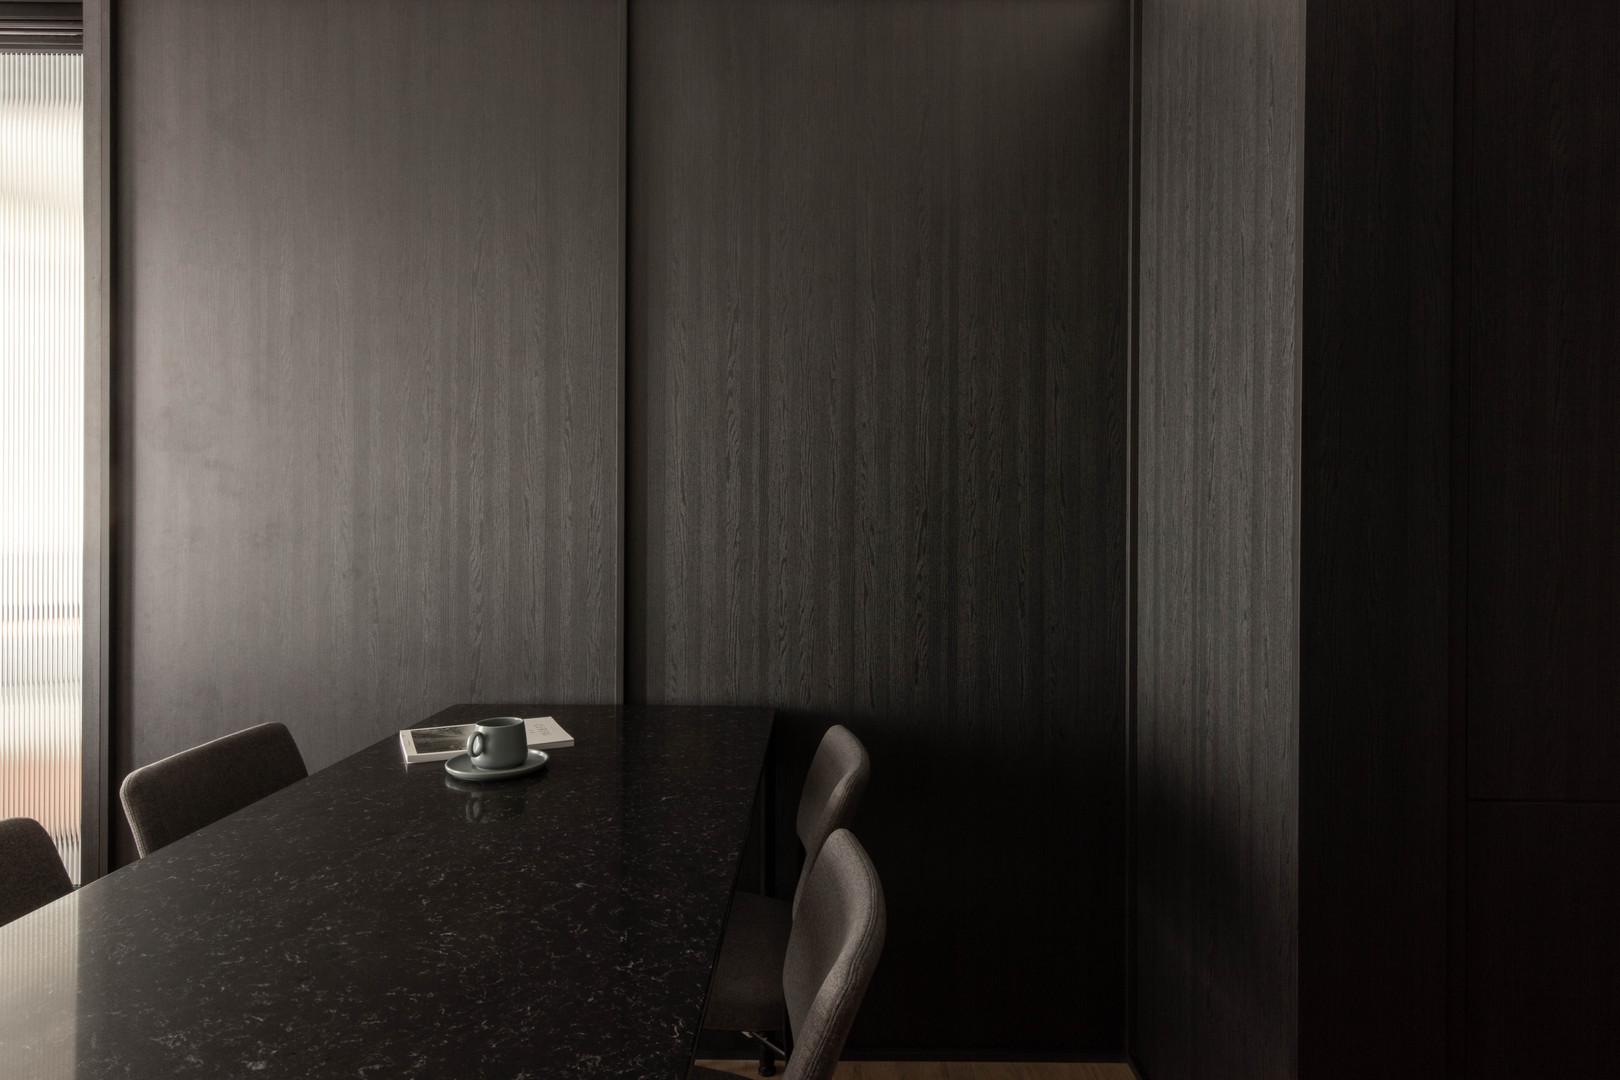 Hock Hoon, Soh Xin Hui, Ng Ci En, Ng Chin Hok, Chua Min Sheng, Loft, Studio Apartment, Jake Goh, Fluted glass, Leather sofa, Interior Design Singapore, Sennett Residences, Bachelor Pad, Best Carpenter Singapore, Best Interior Designer Singapore